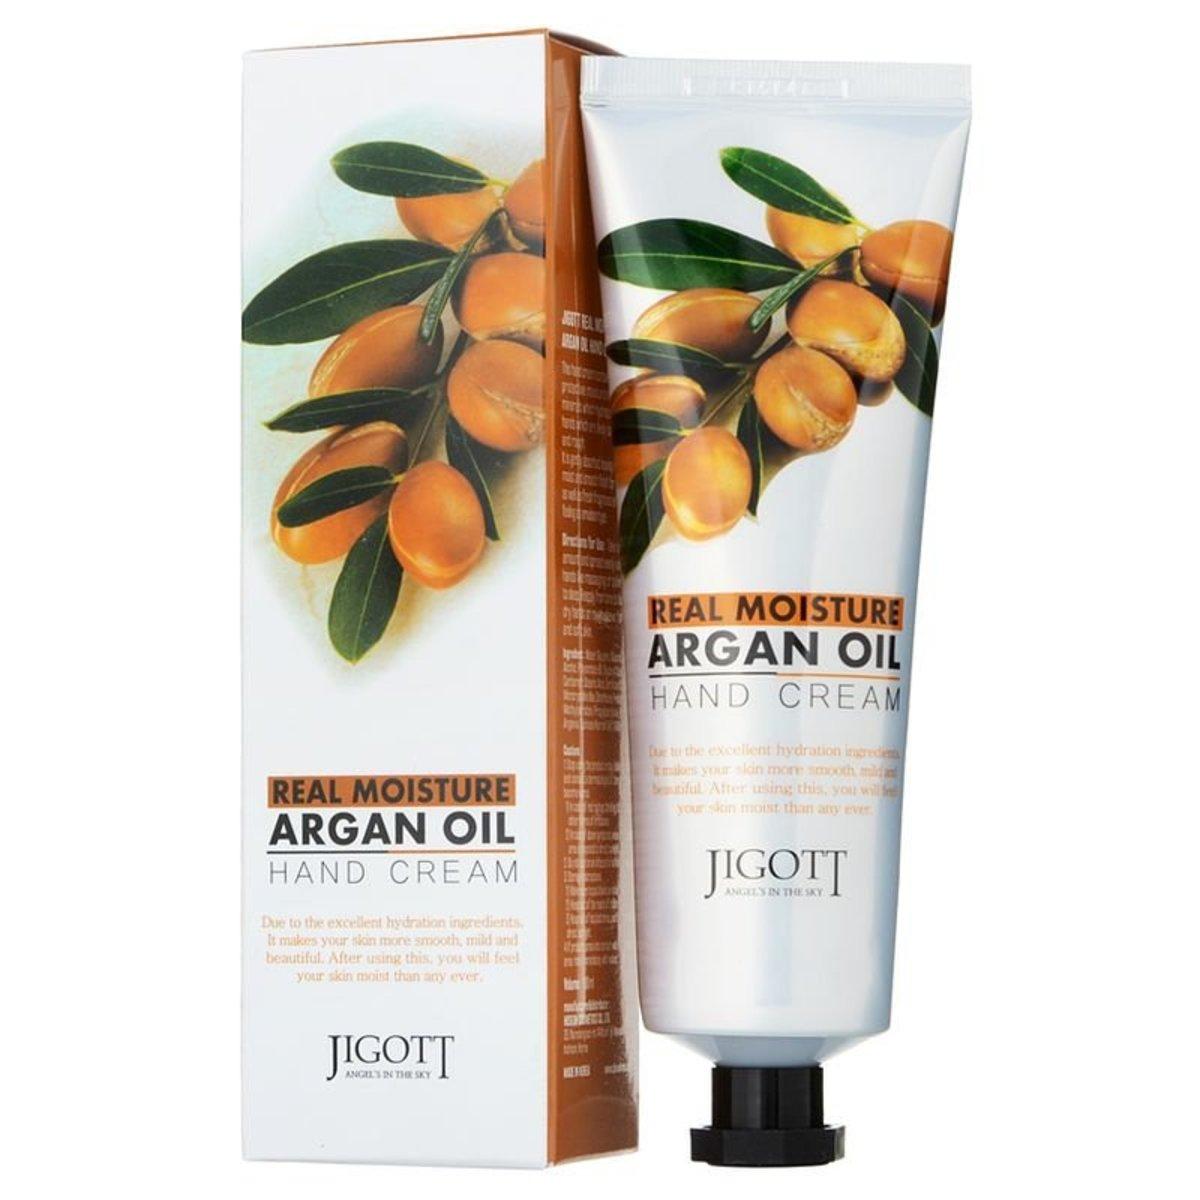 Real Moisture Hand Cream 100ml - Argan Oil    [Parallel Import Product]